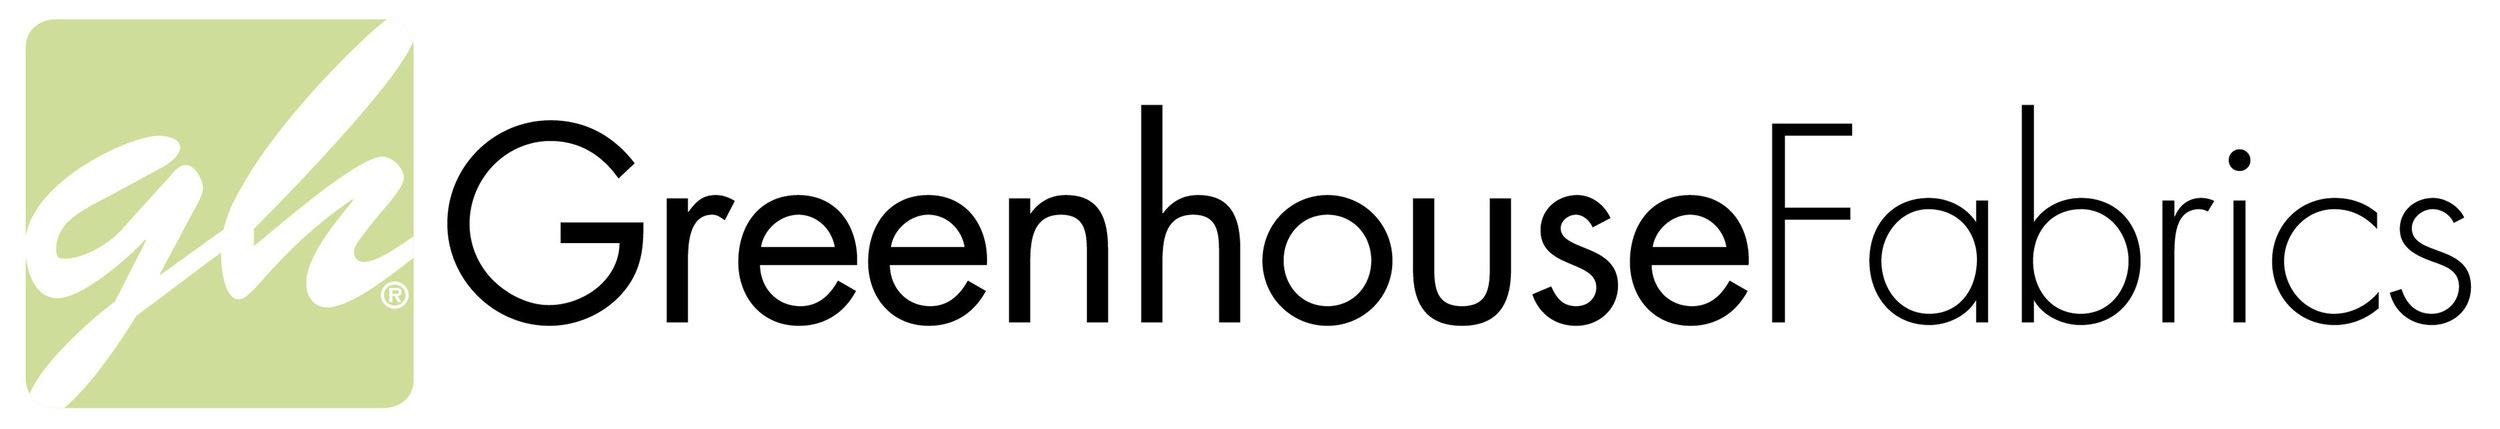 Greenhouse-Fabrics-Logo_14in.jpg